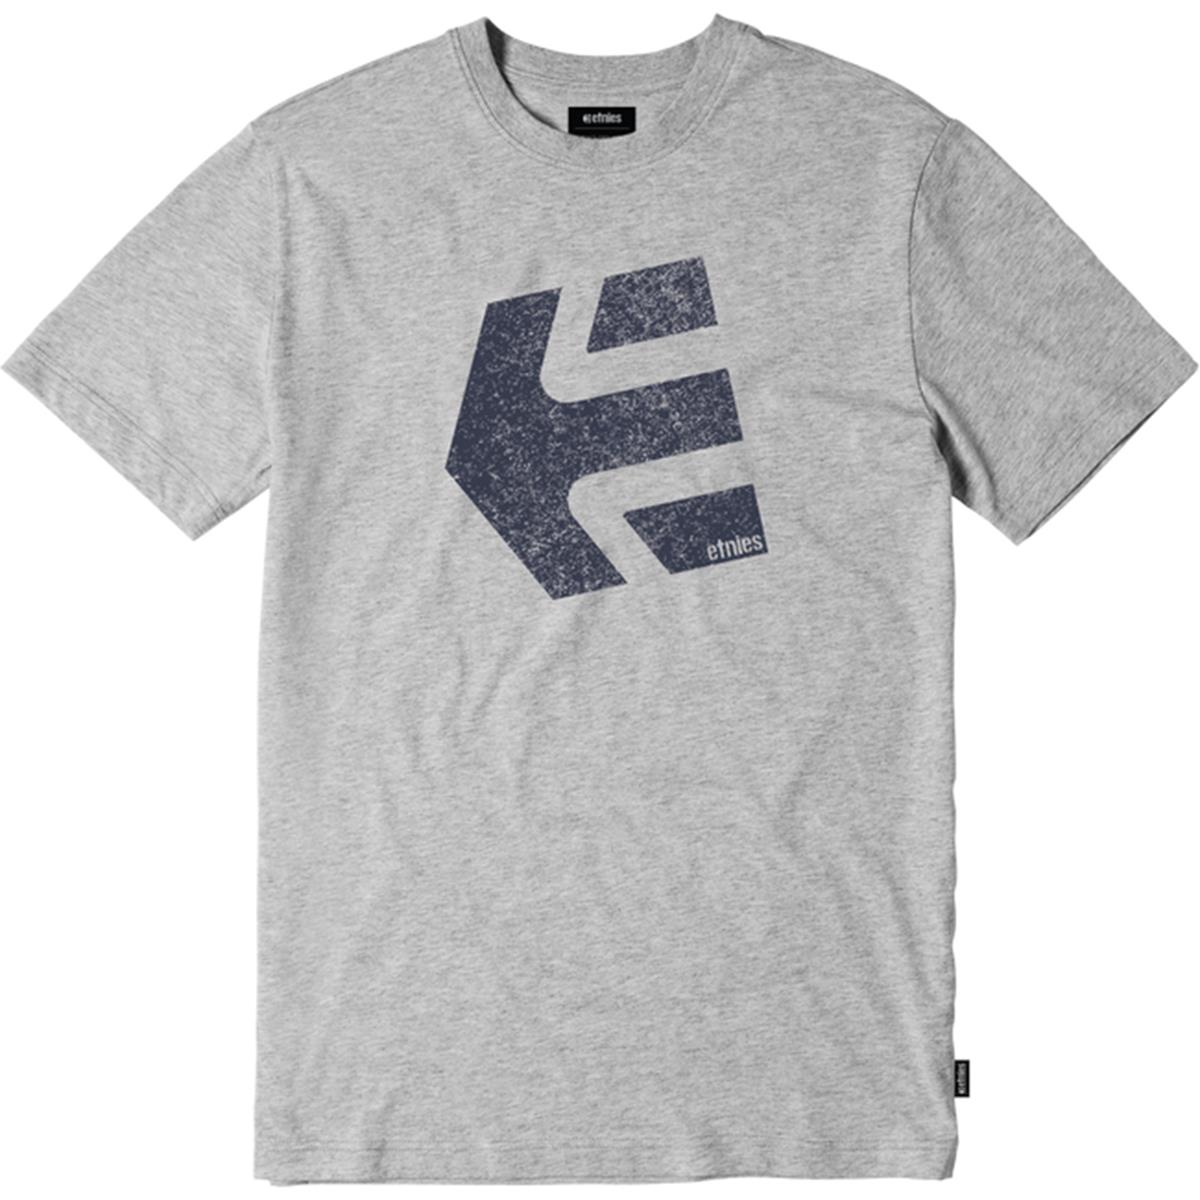 Etnies T-Shirt Logomania Grau meliert